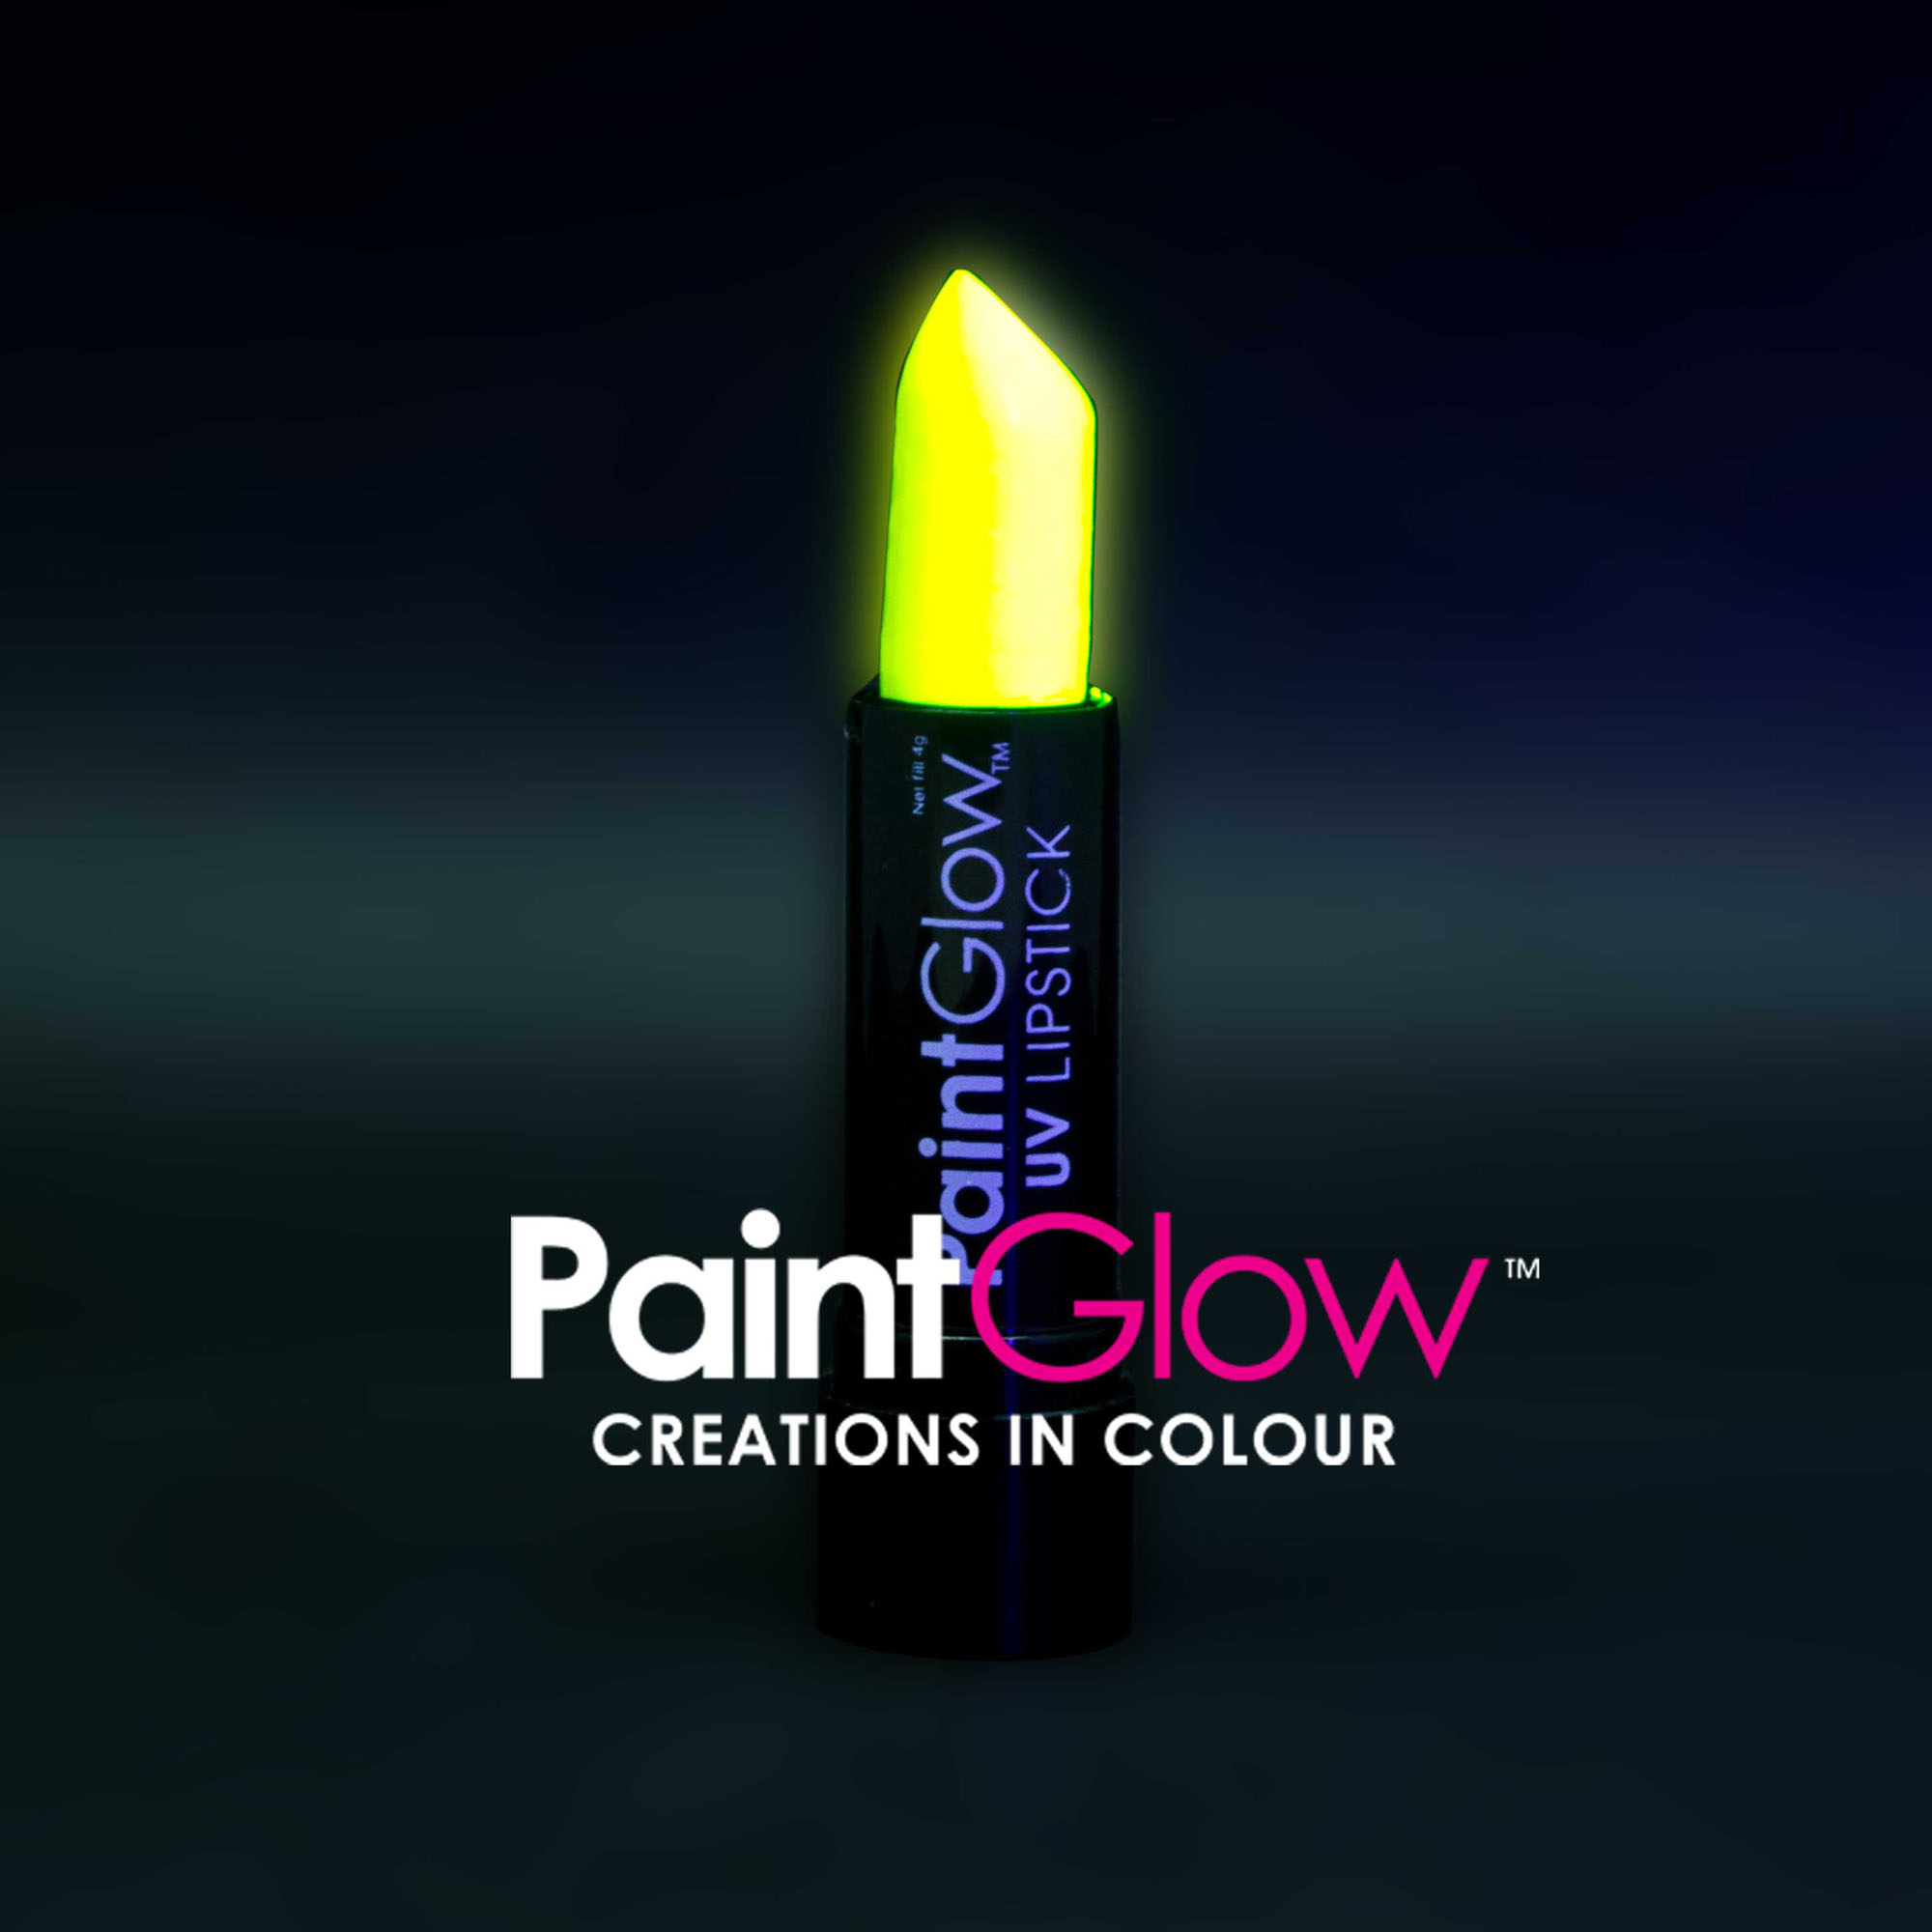 Makeup U V Lipstick Neon SFX Cosmetic Artist